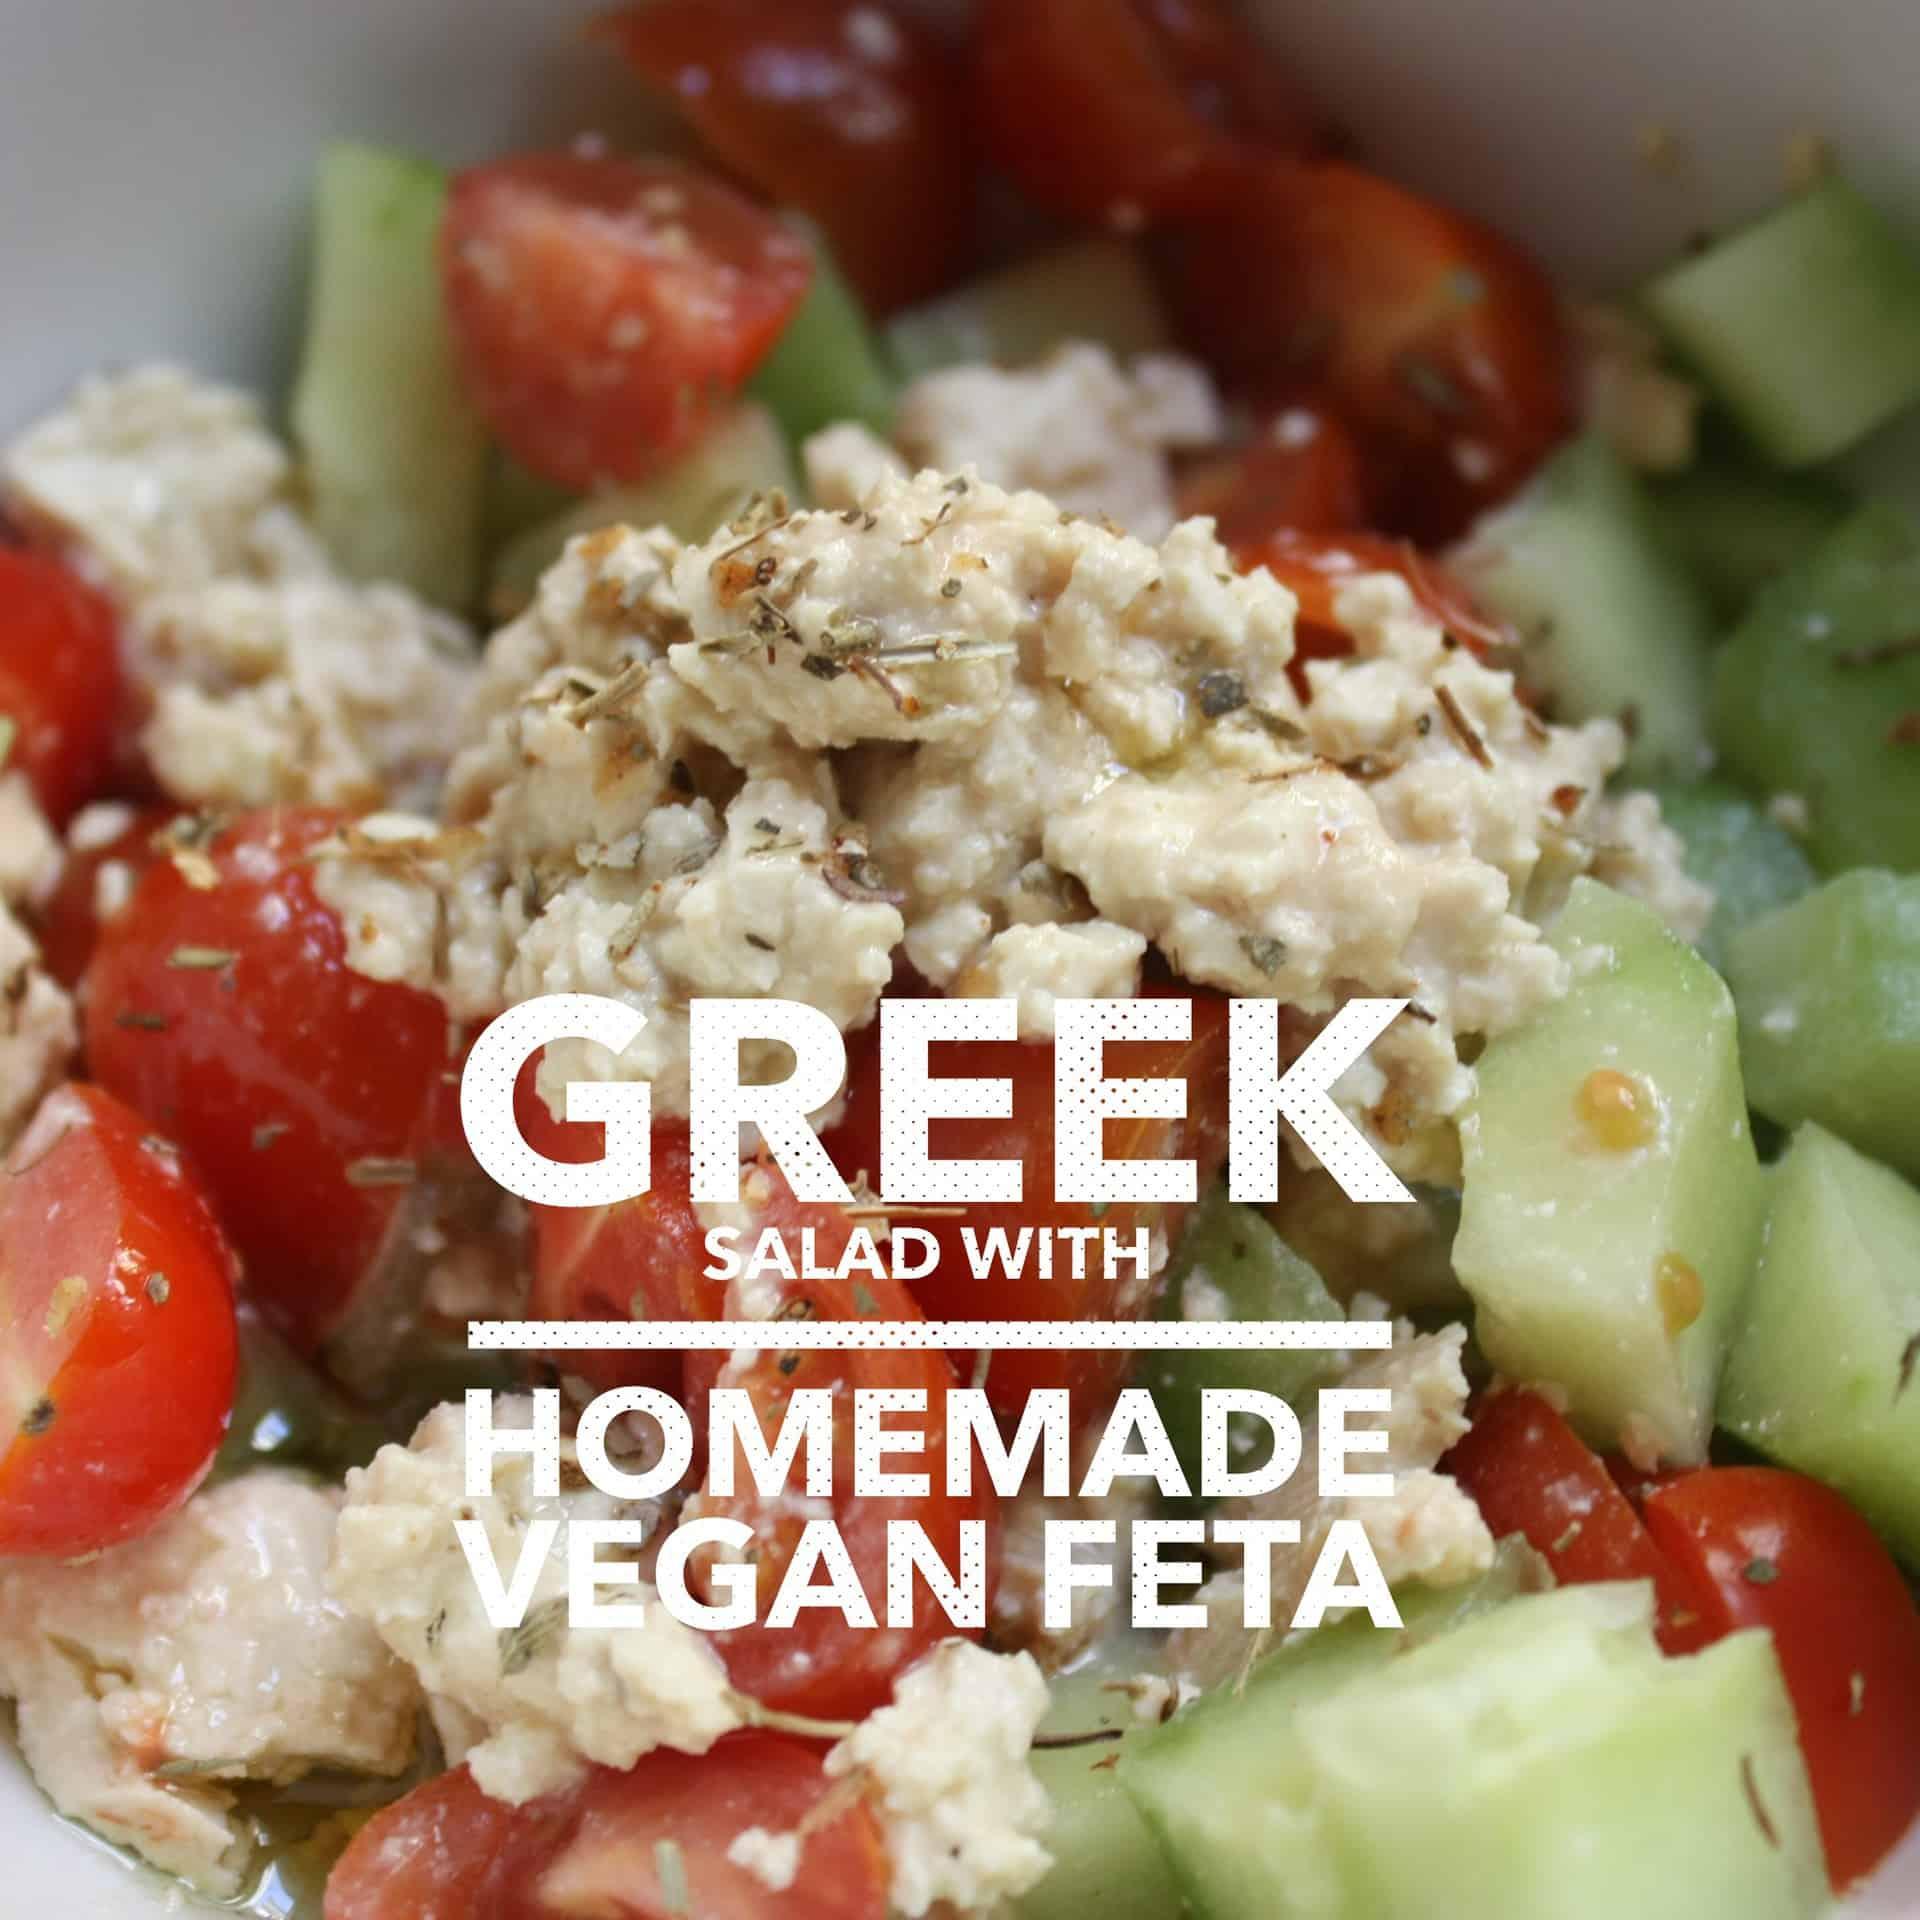 Greek salad with homemade vegan feta